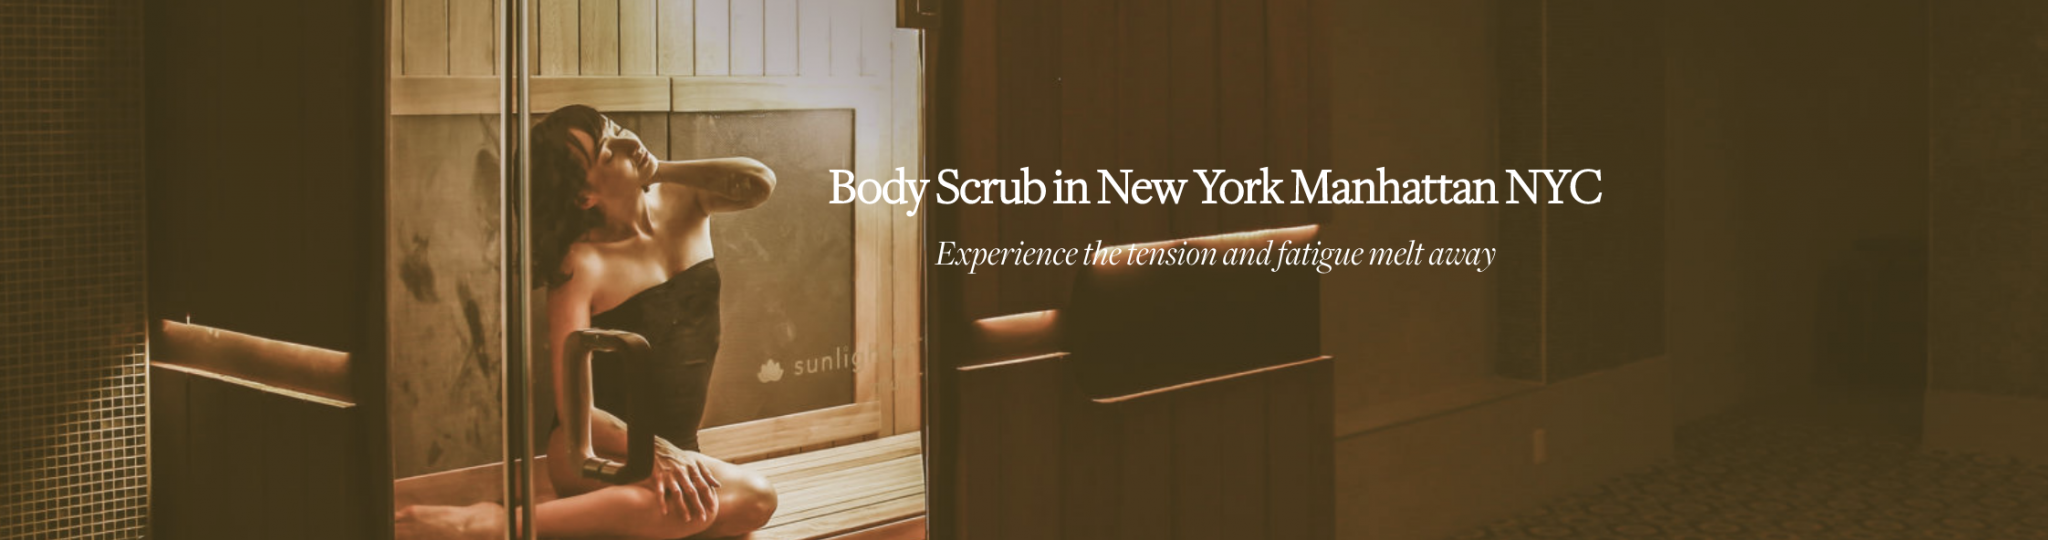 body scrub in New York NYC